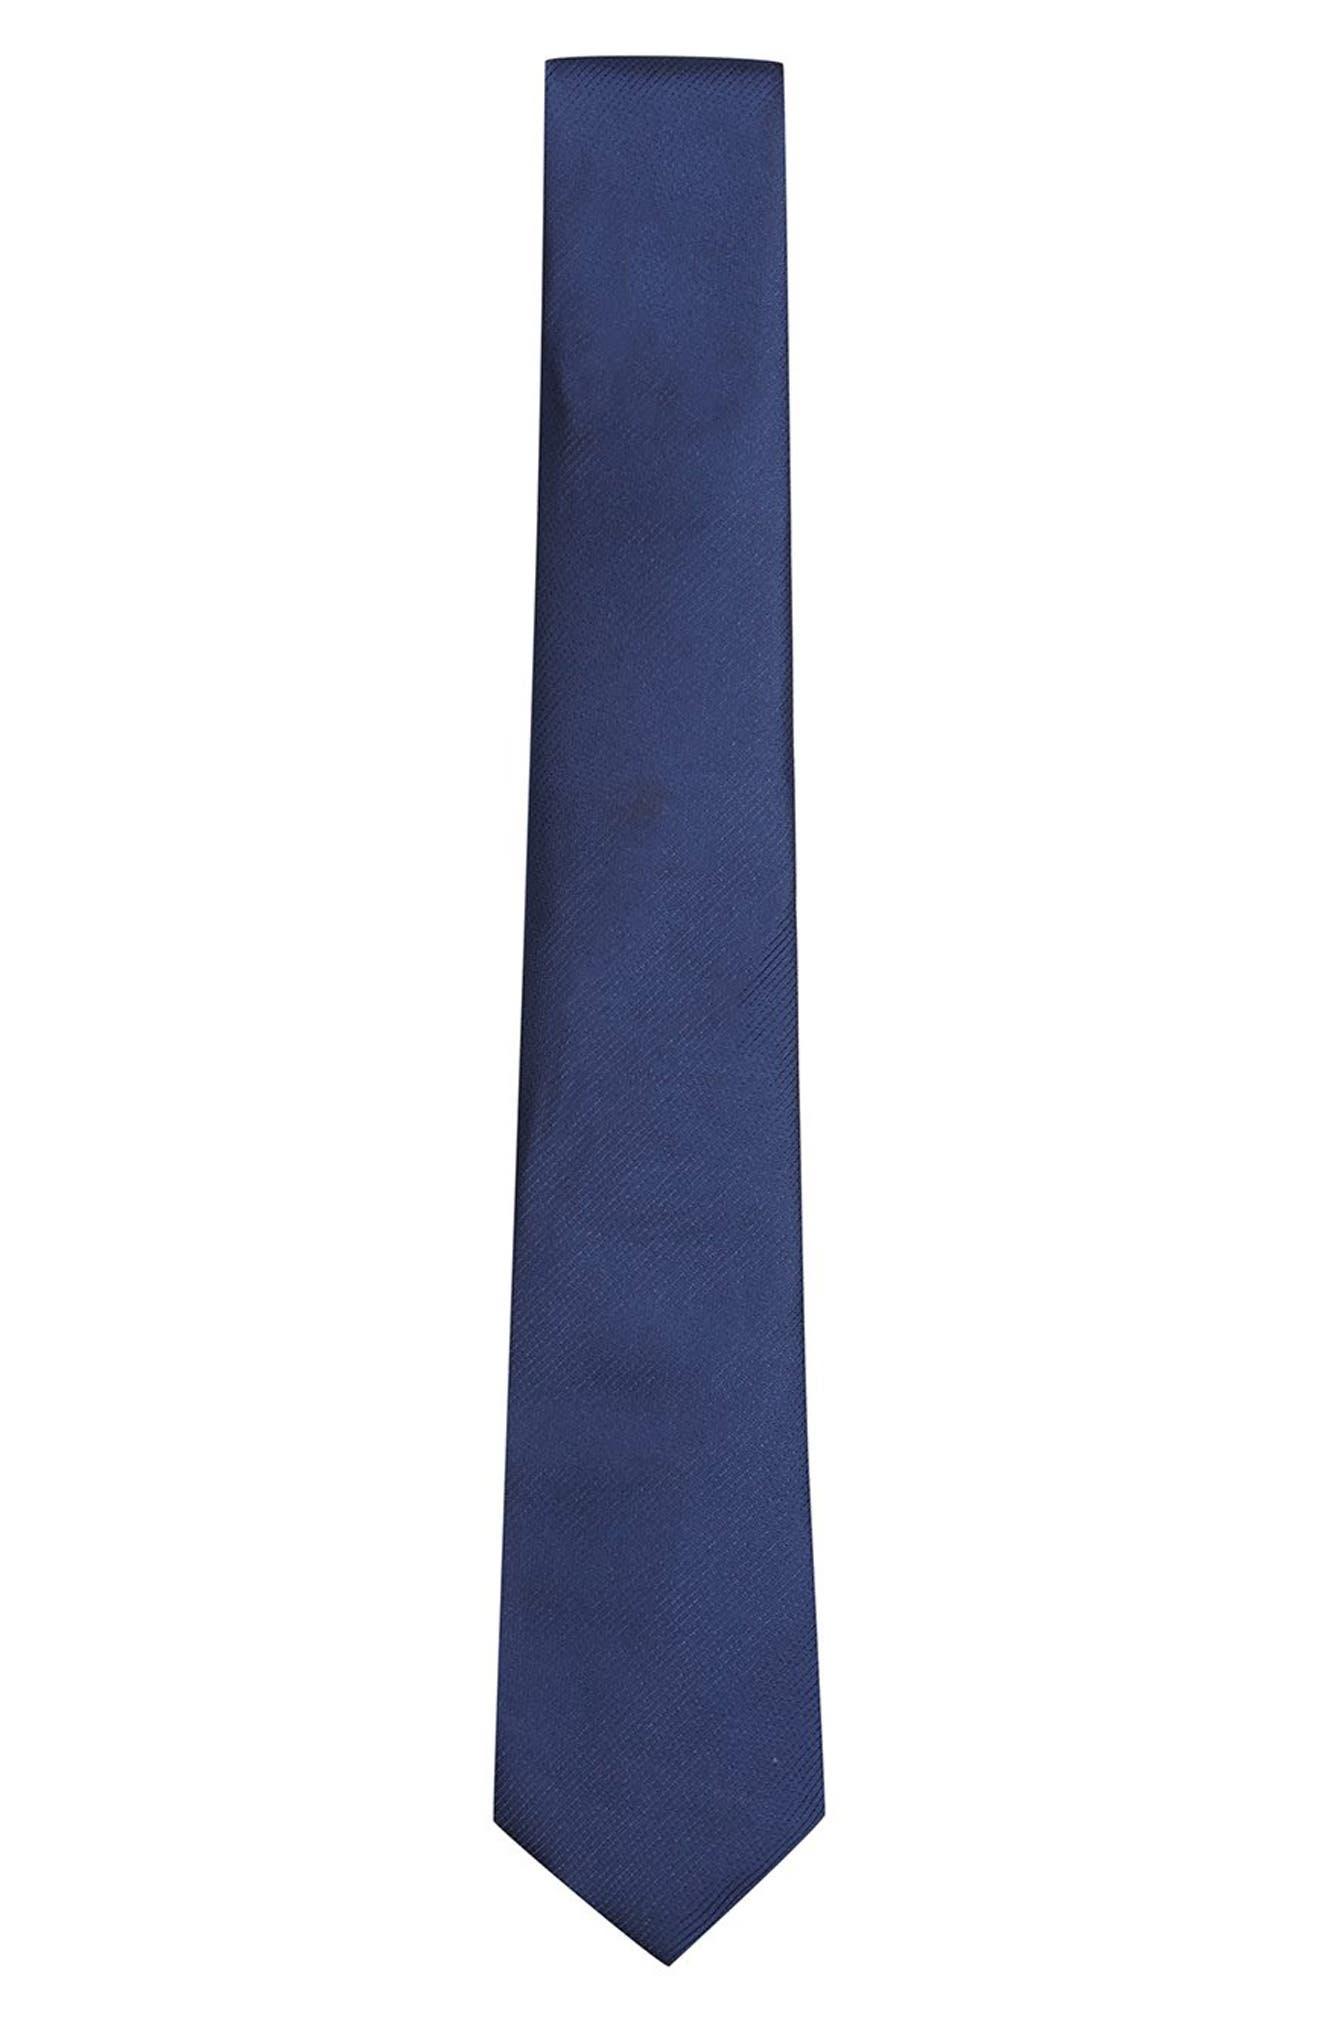 Woven Tie,                             Main thumbnail 1, color,                             NAVY BLUE